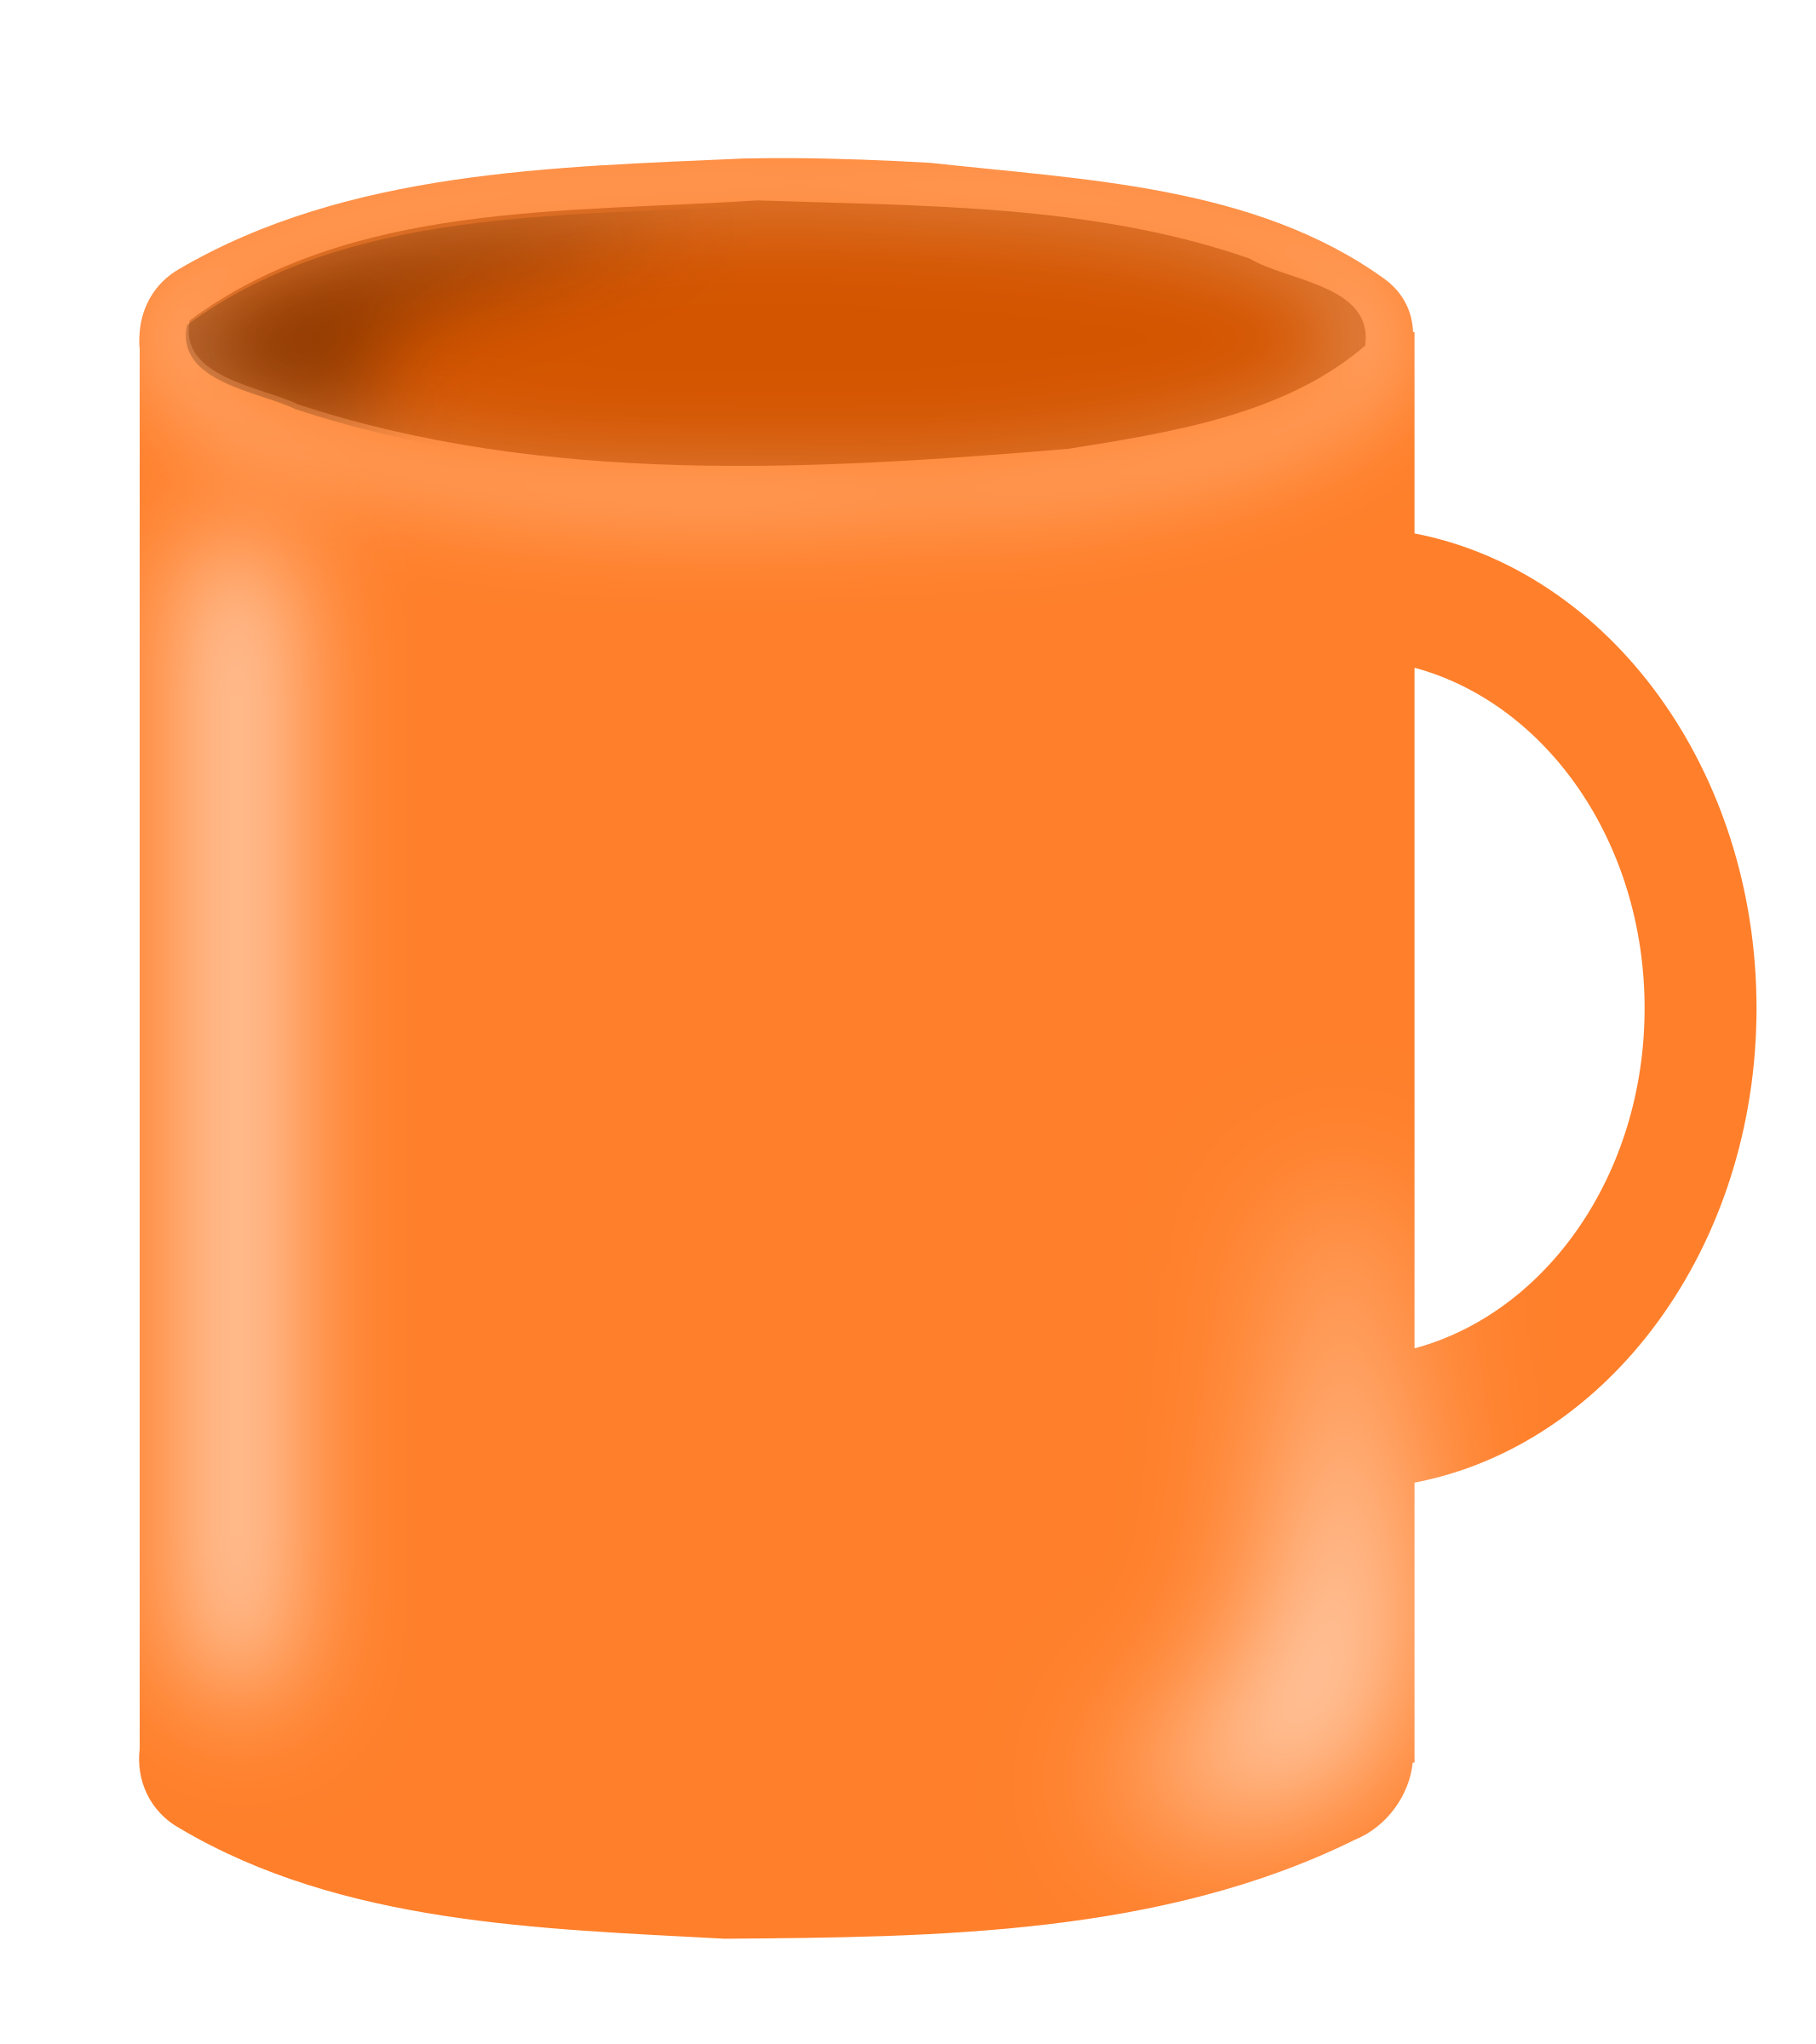 Mug big image png. Clipart cup tumbler